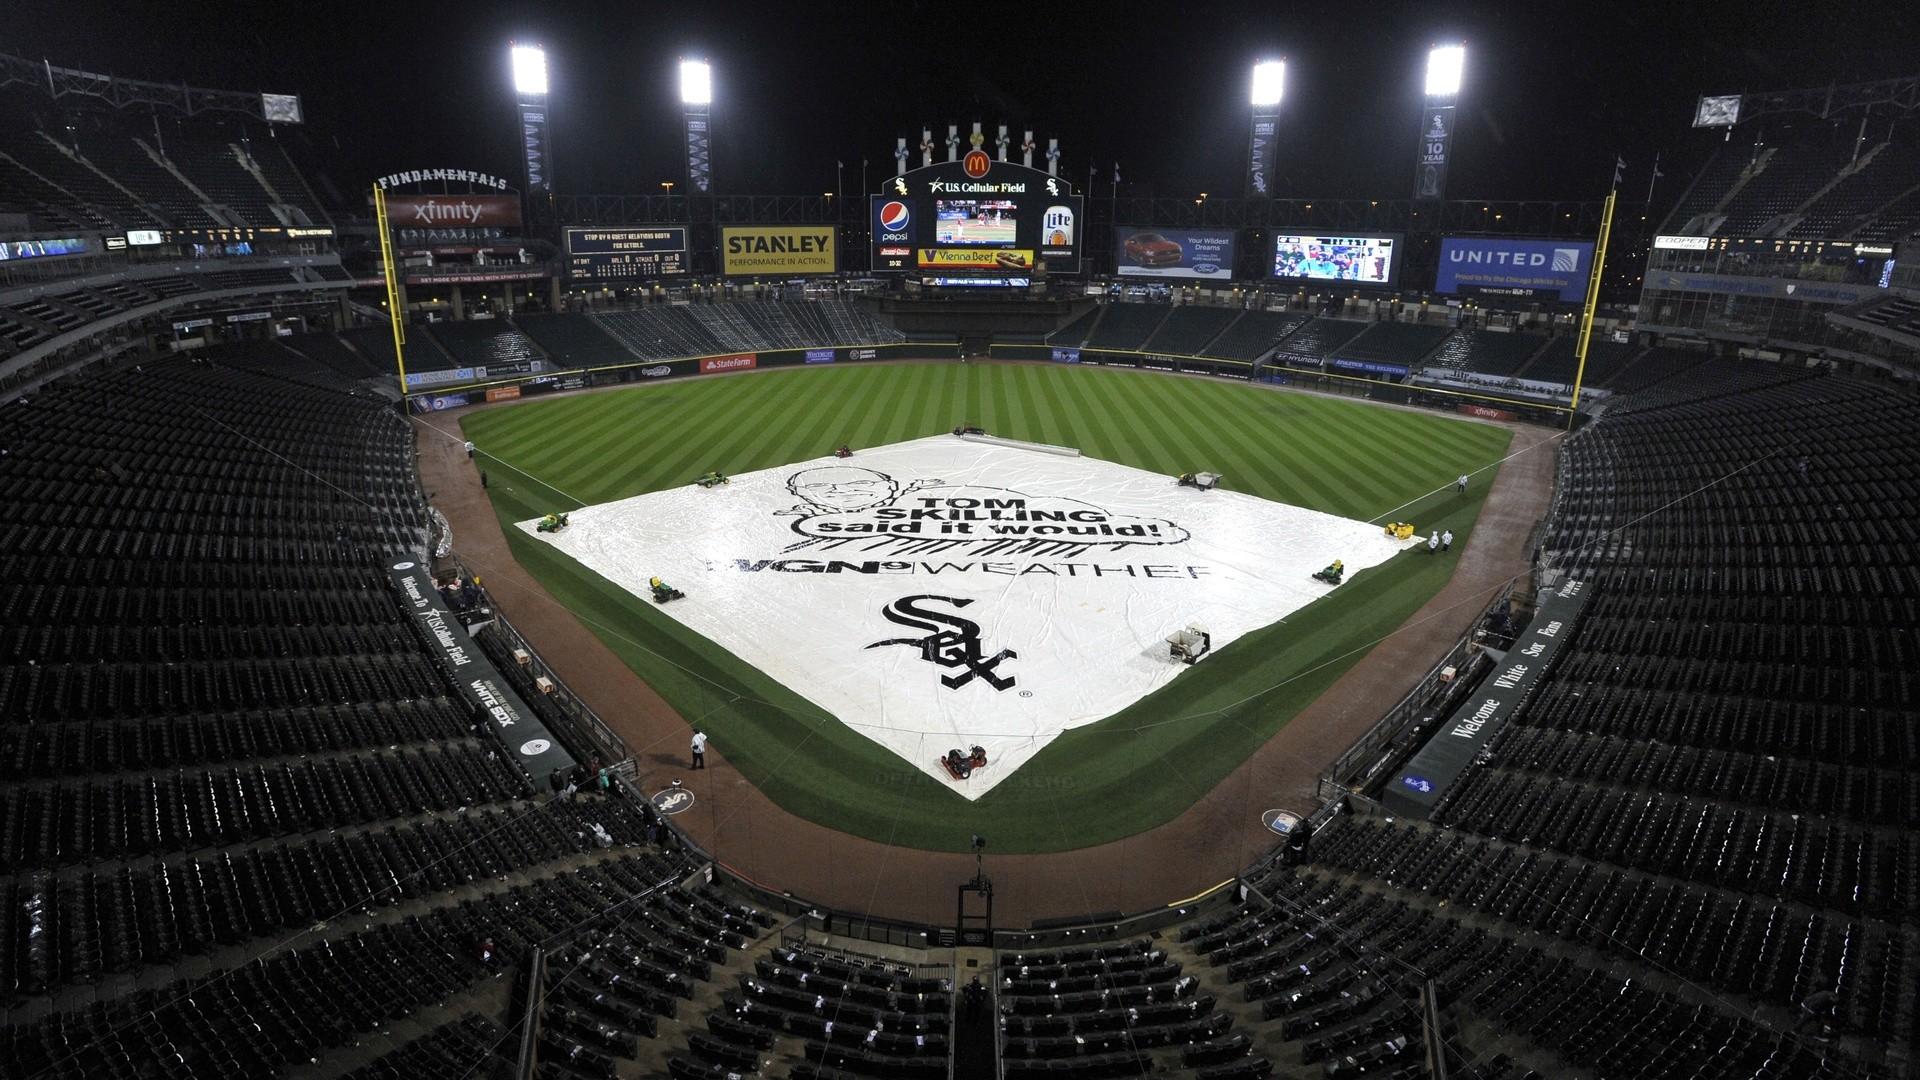 Sports, Chicago White Sox Stadium, Mlb, Baseball, Stadium, Chicago White Sox